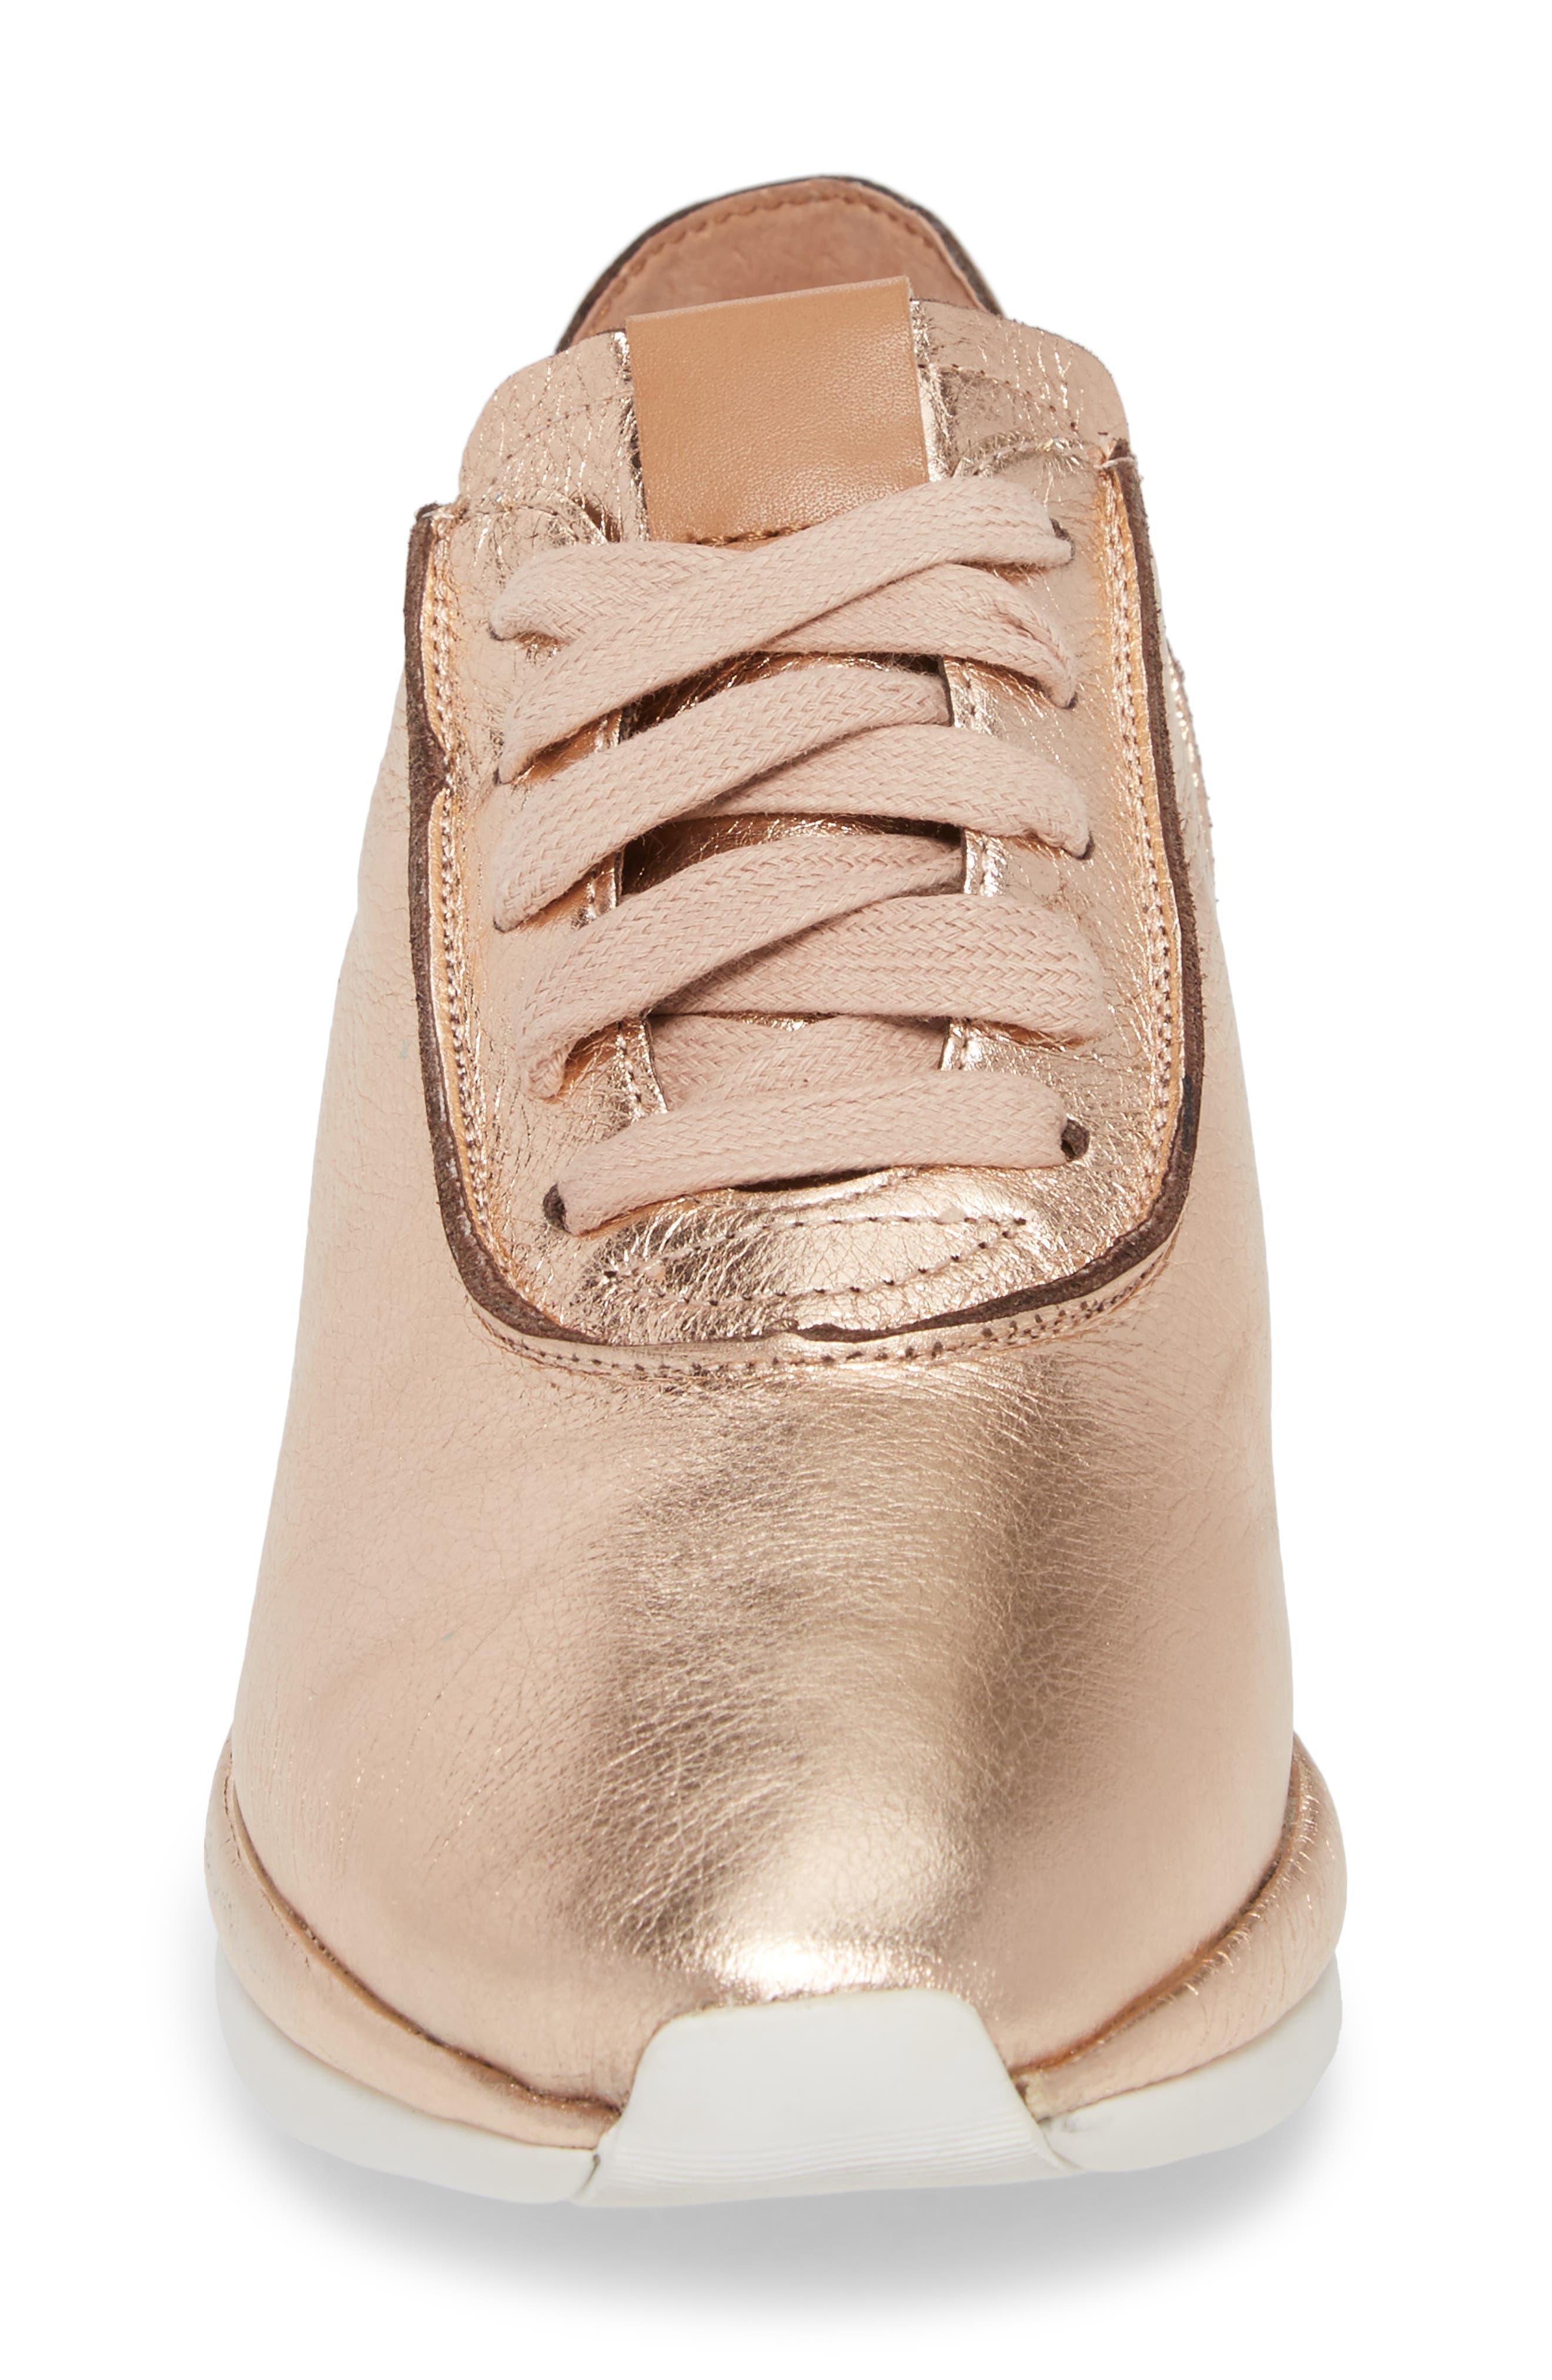 Raina Sneaker,                             Alternate thumbnail 4, color,                             ROSE GOLD METALLIC LEATHER